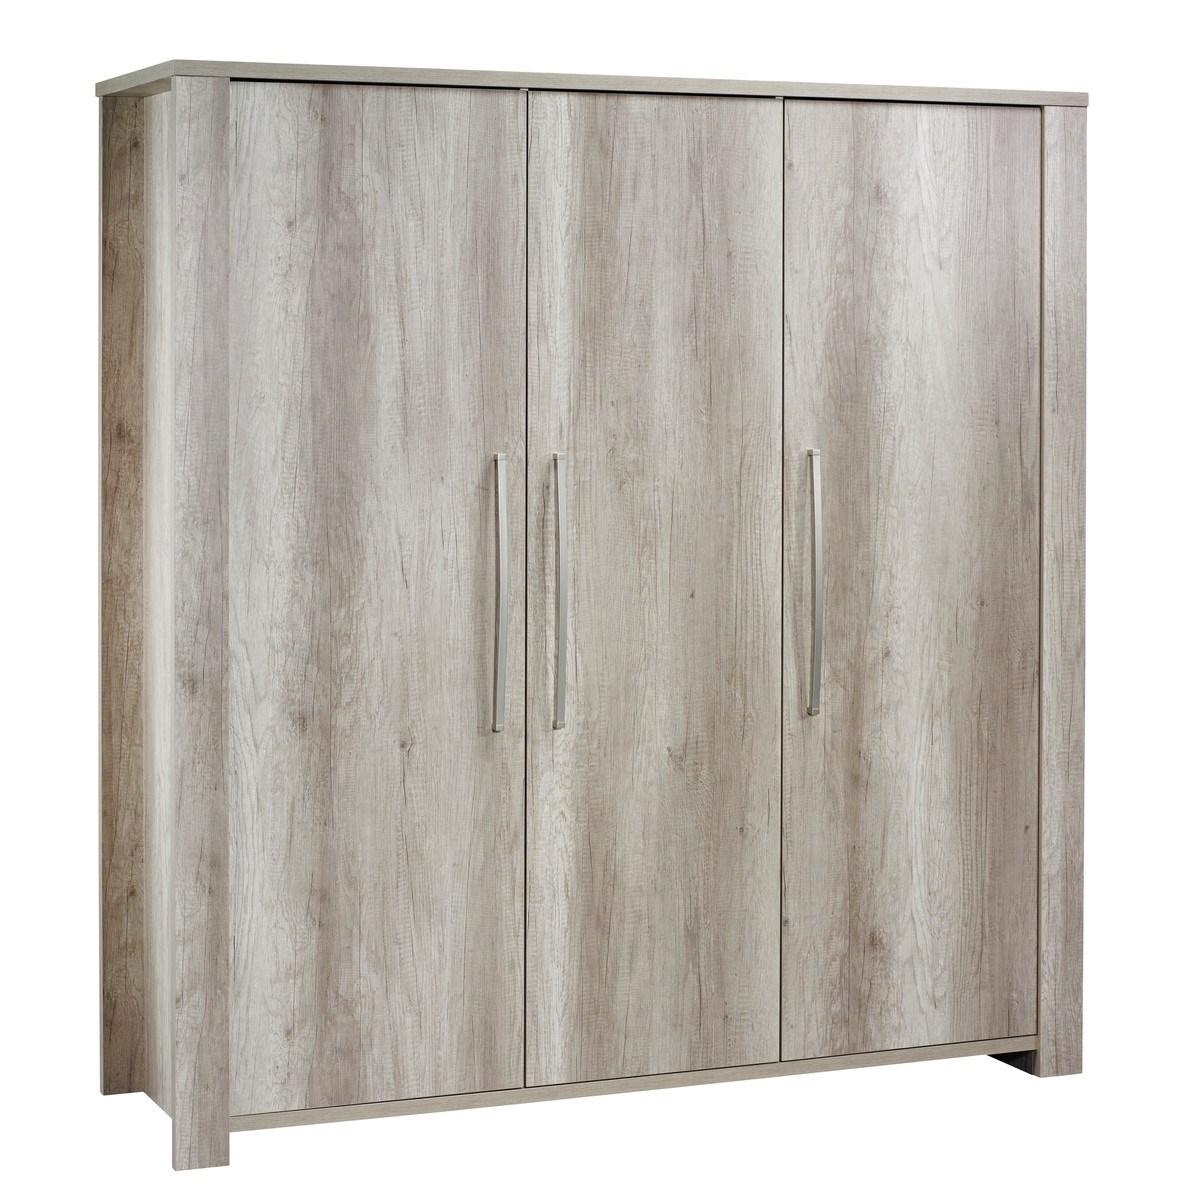 Armoire 3 portes en bois marron